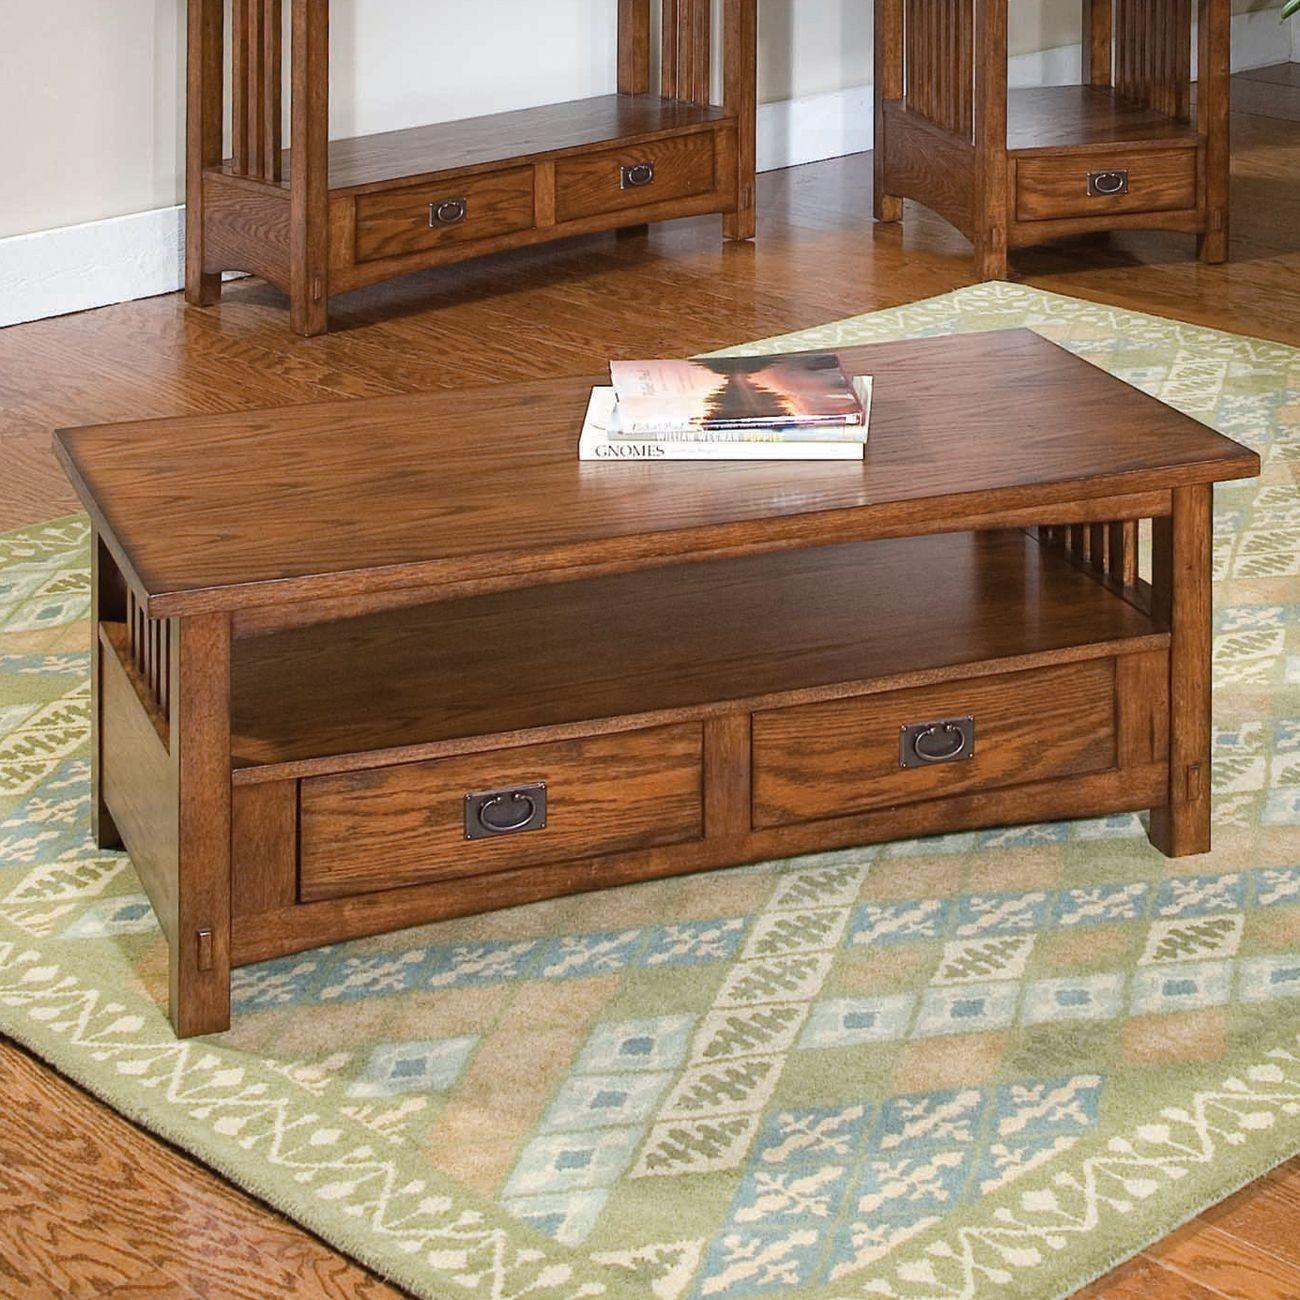 Peters Revington 280621 Lake Placid Rectangular Cocktail Table Coffee Table Furniture Craftsman Furniture [ 1300 x 1300 Pixel ]